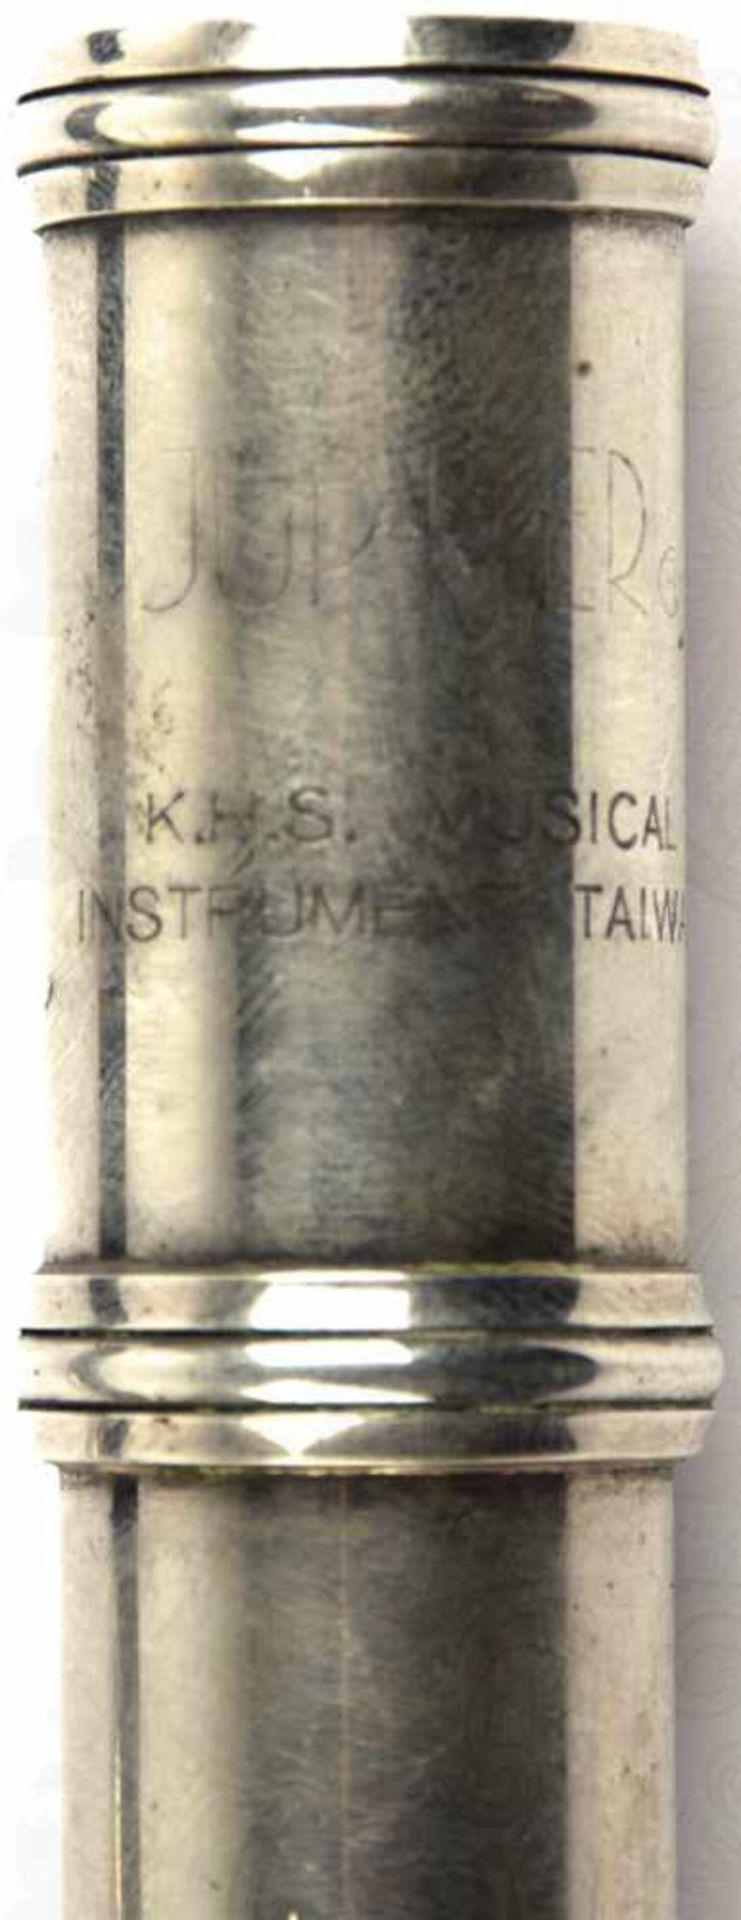 "QUERFLÖTE, Leichtmetall/vernickelt, m. Kopf-, Mittel u. Fußstück, Herst. ""Jupiter"", K.H.S. Musical - Bild 3 aus 4"